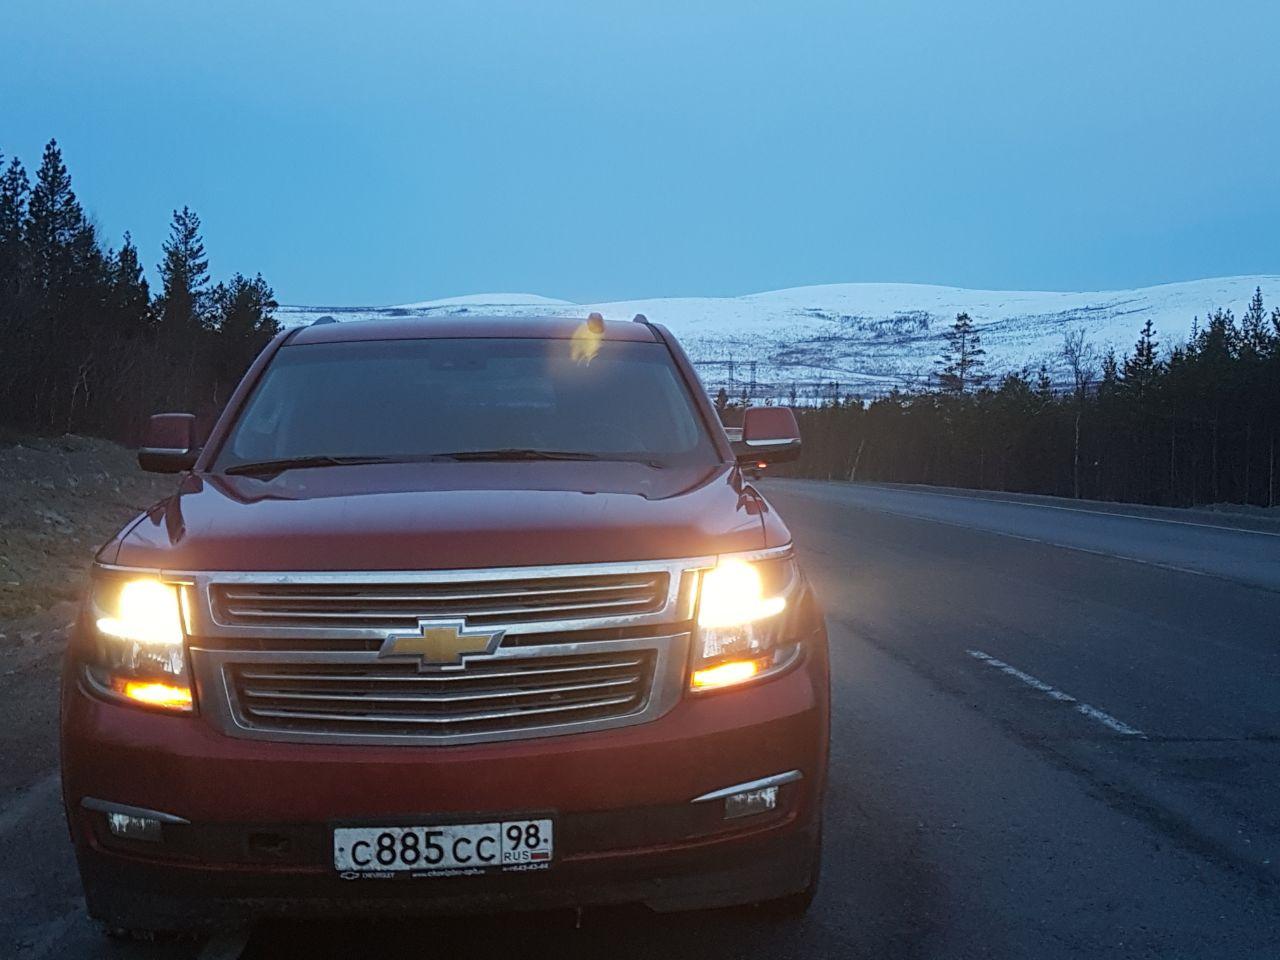 Дорога Питер Мурманск я на Родине бортжурнал Chevrolet Tahoe Красная Красавица 2016 года на